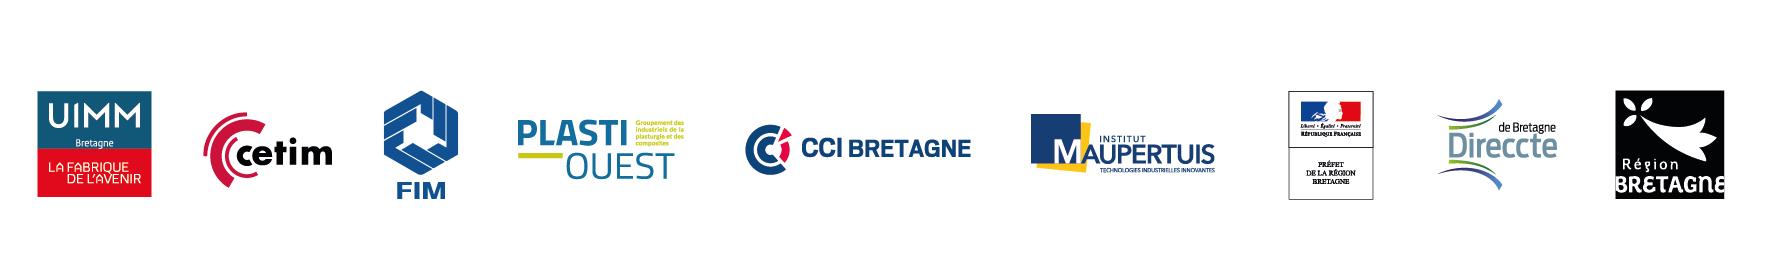 partenaires du CDIB